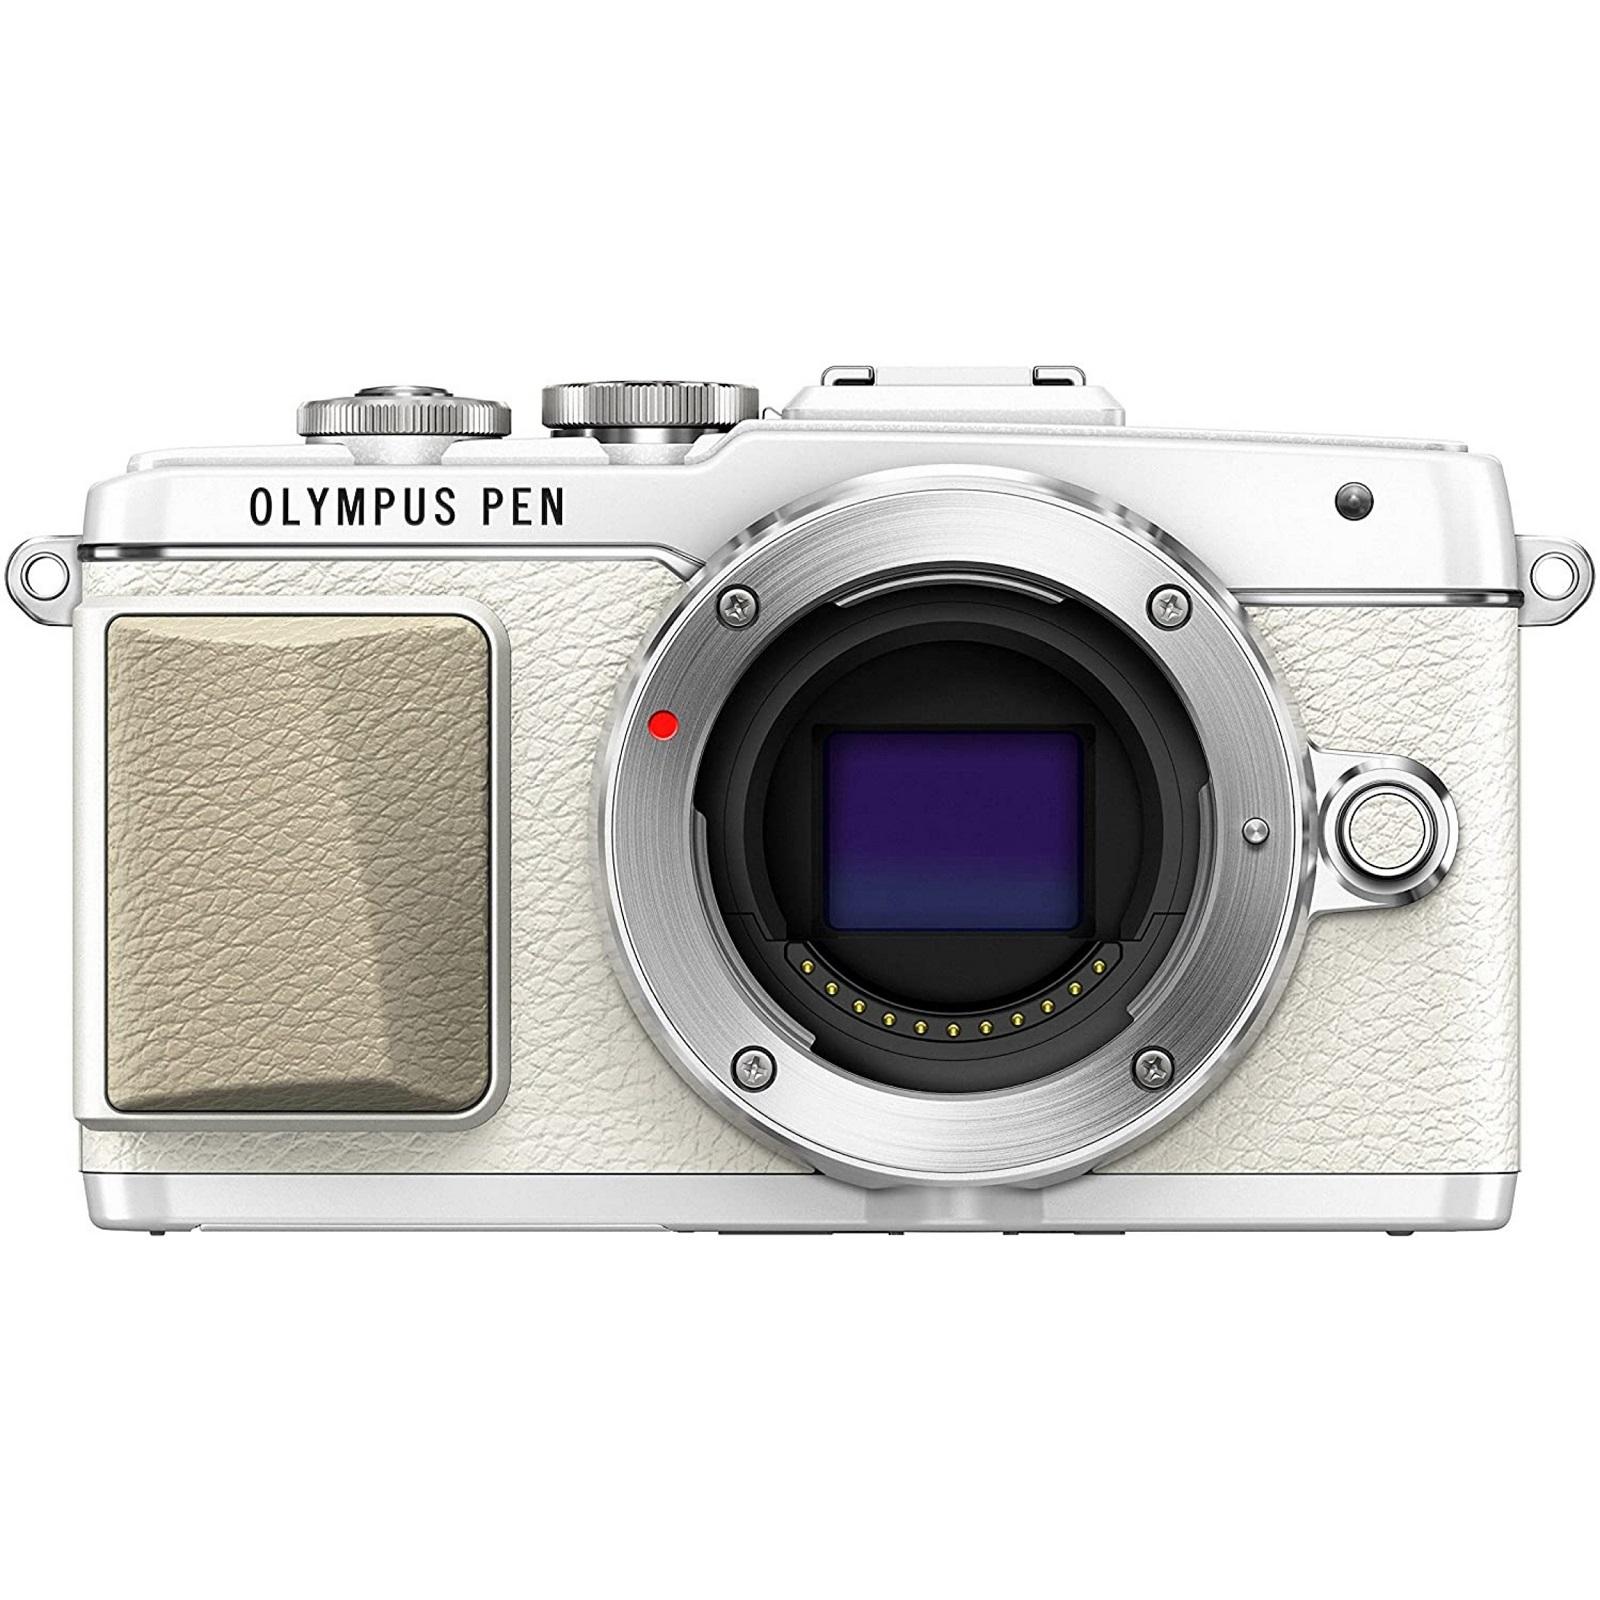 OLYMPUS オリンパス ミラーレス一眼カメラ PEN E-PL7 ボディ ホワイト 新品